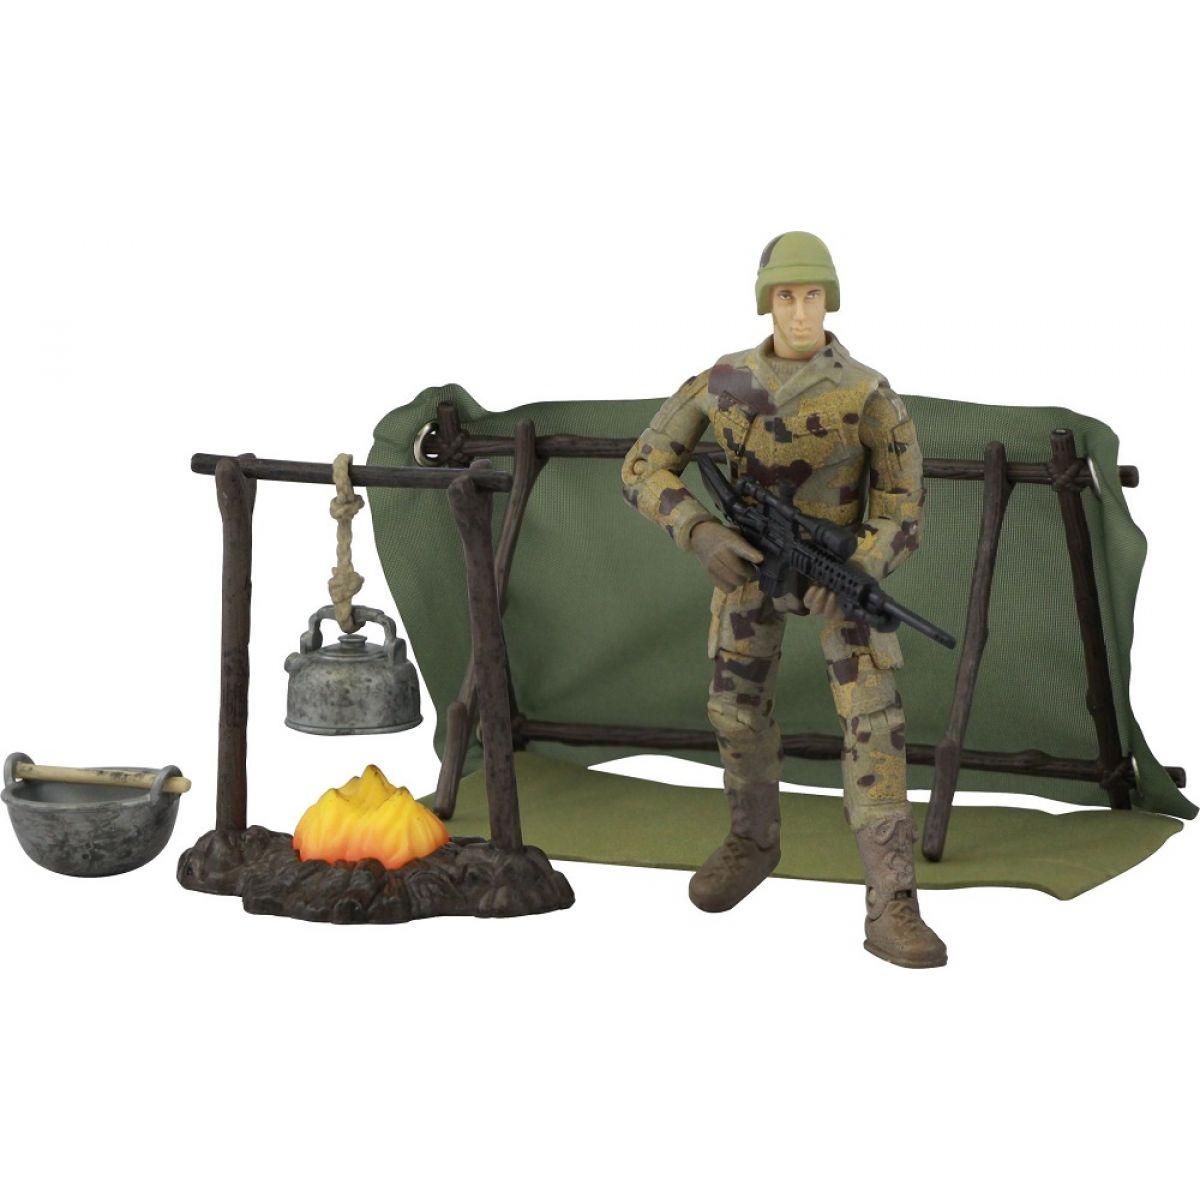 World Peacekeepers Figurka vojáka s doplňky - Voják u ohně